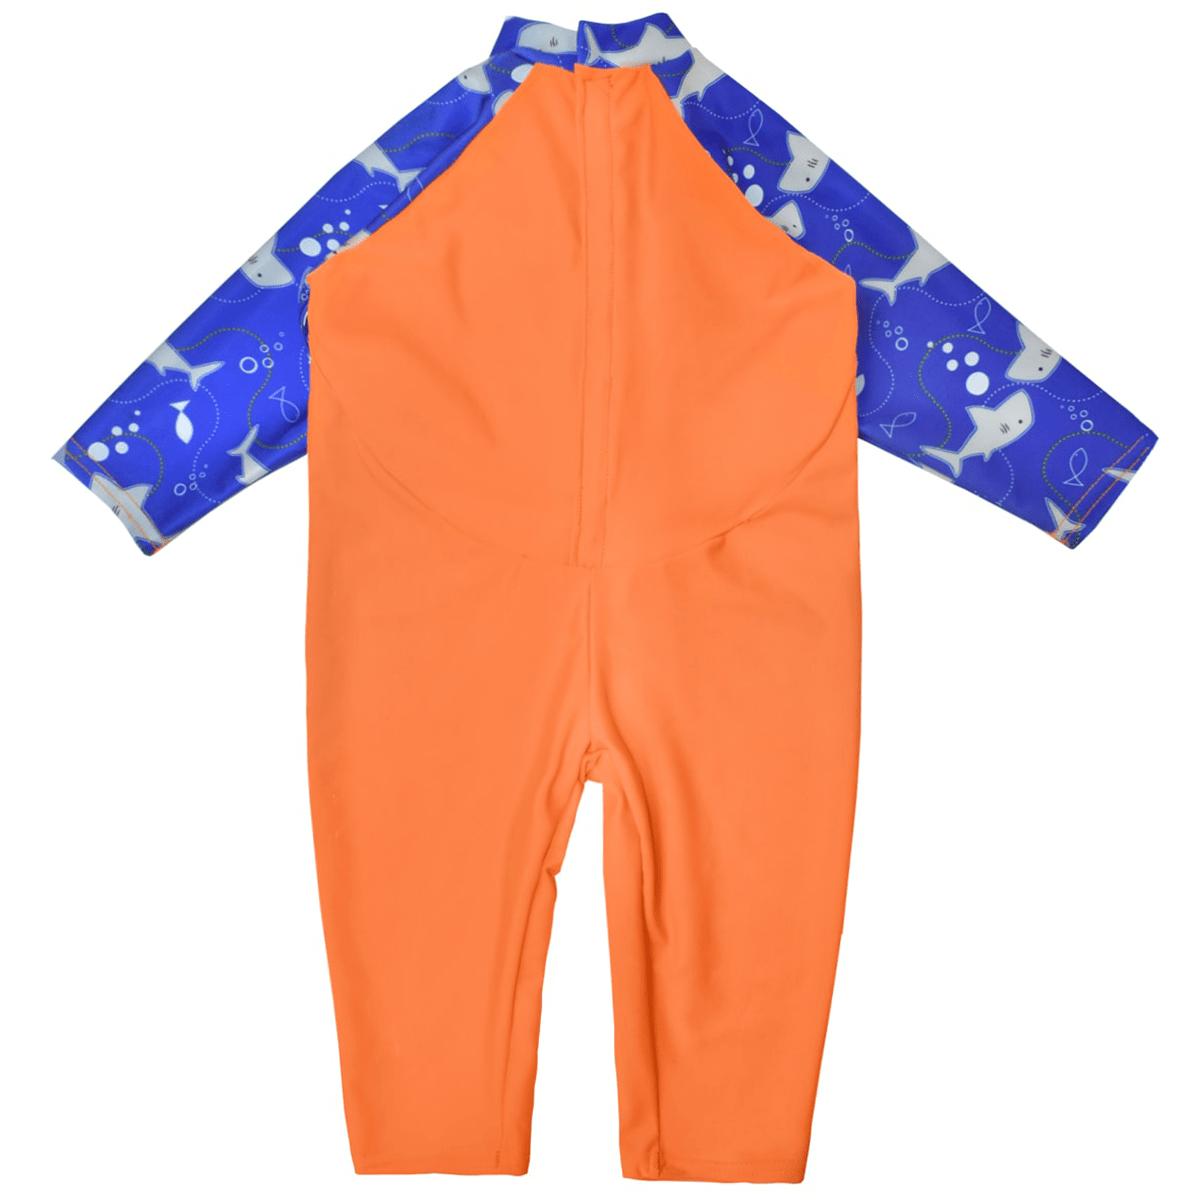 93f789832aaa5 UV All In One Shark Orange | Baby Sun Protection Sunsuit